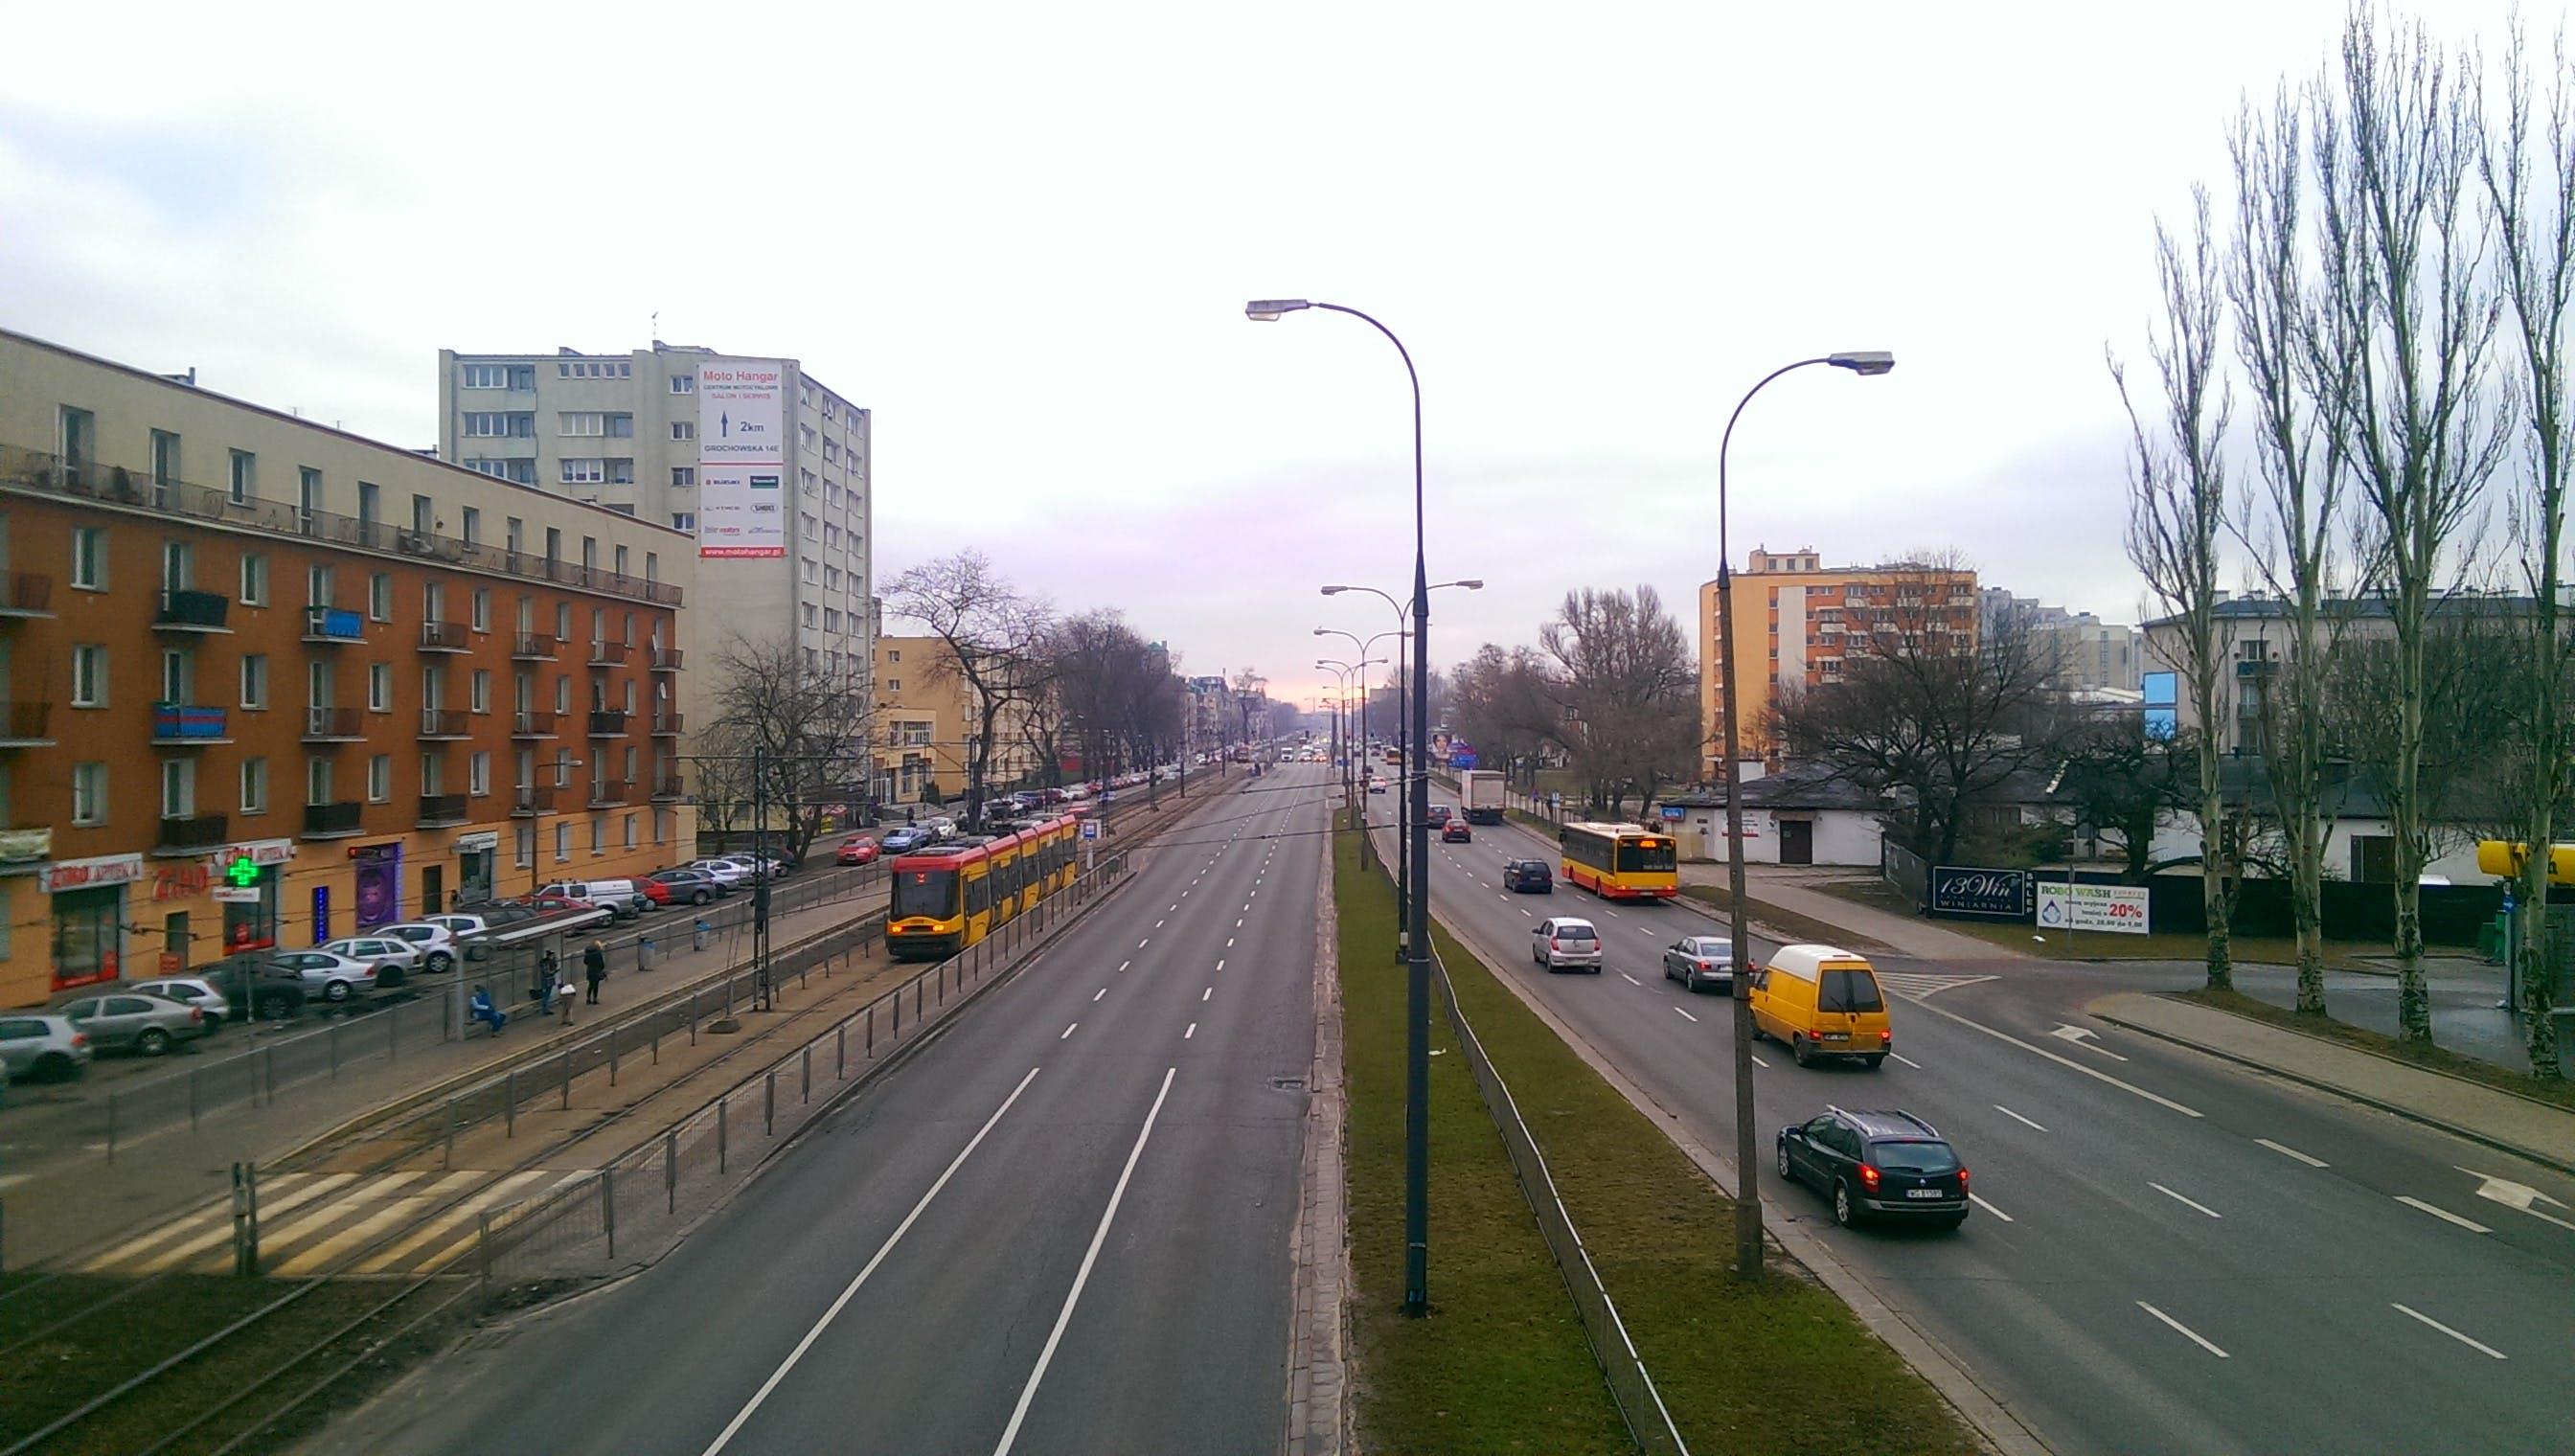 Free stock photo of street, lamps, tram